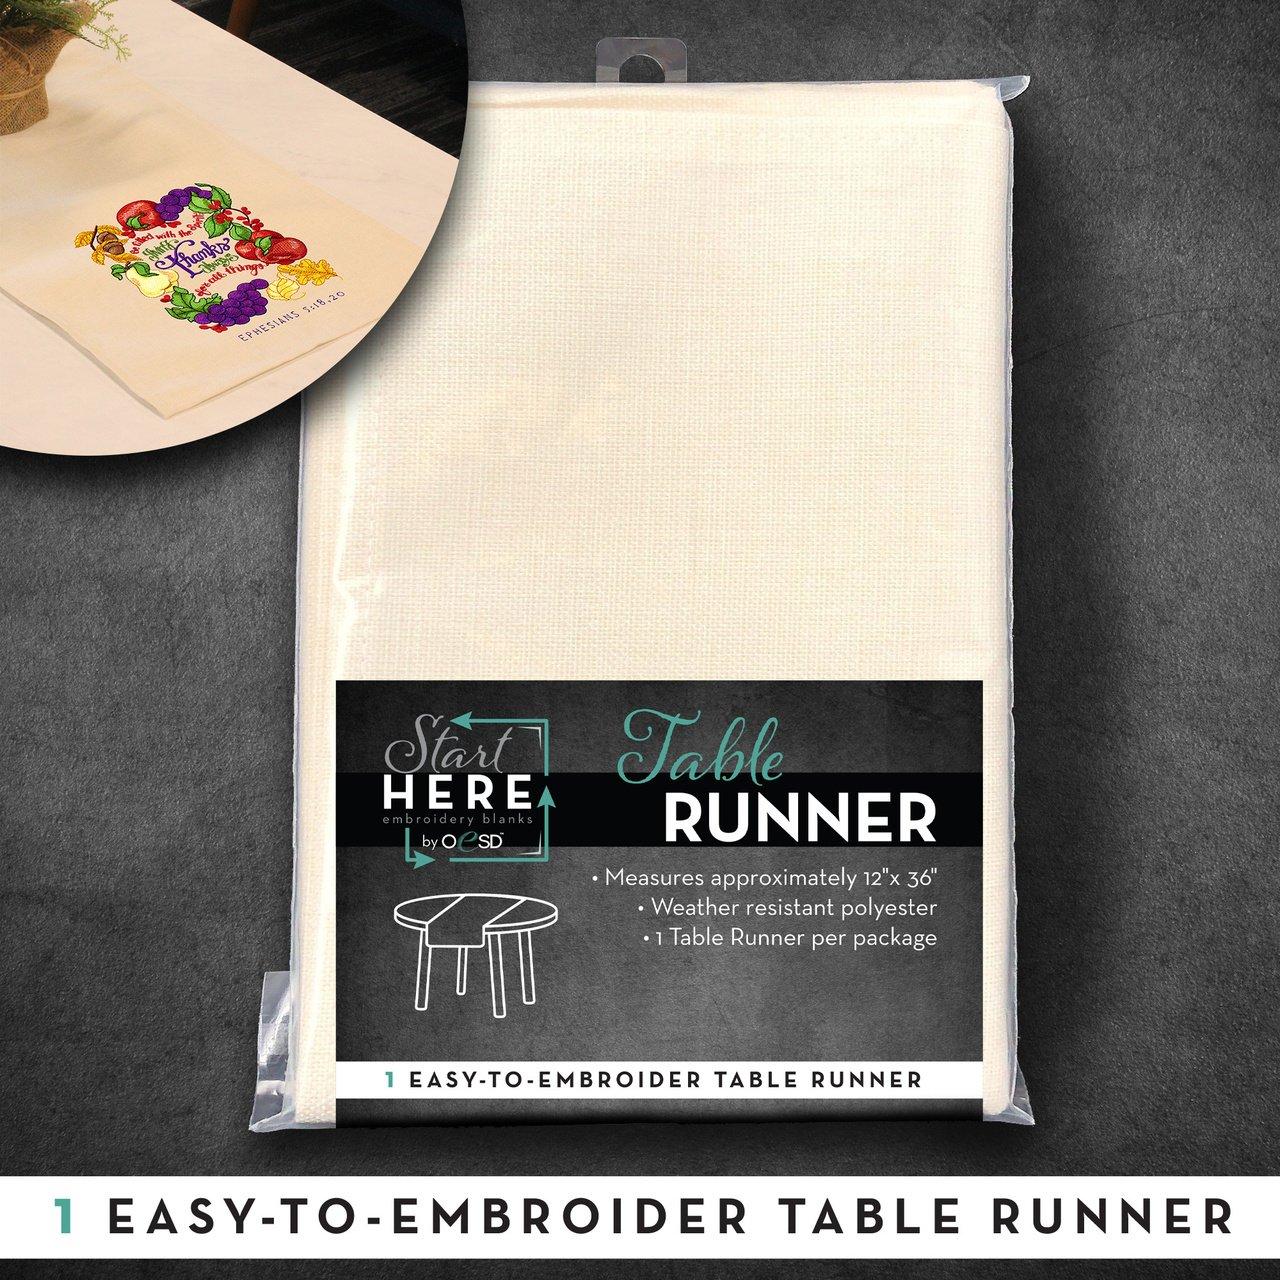 OESD Table Runner White